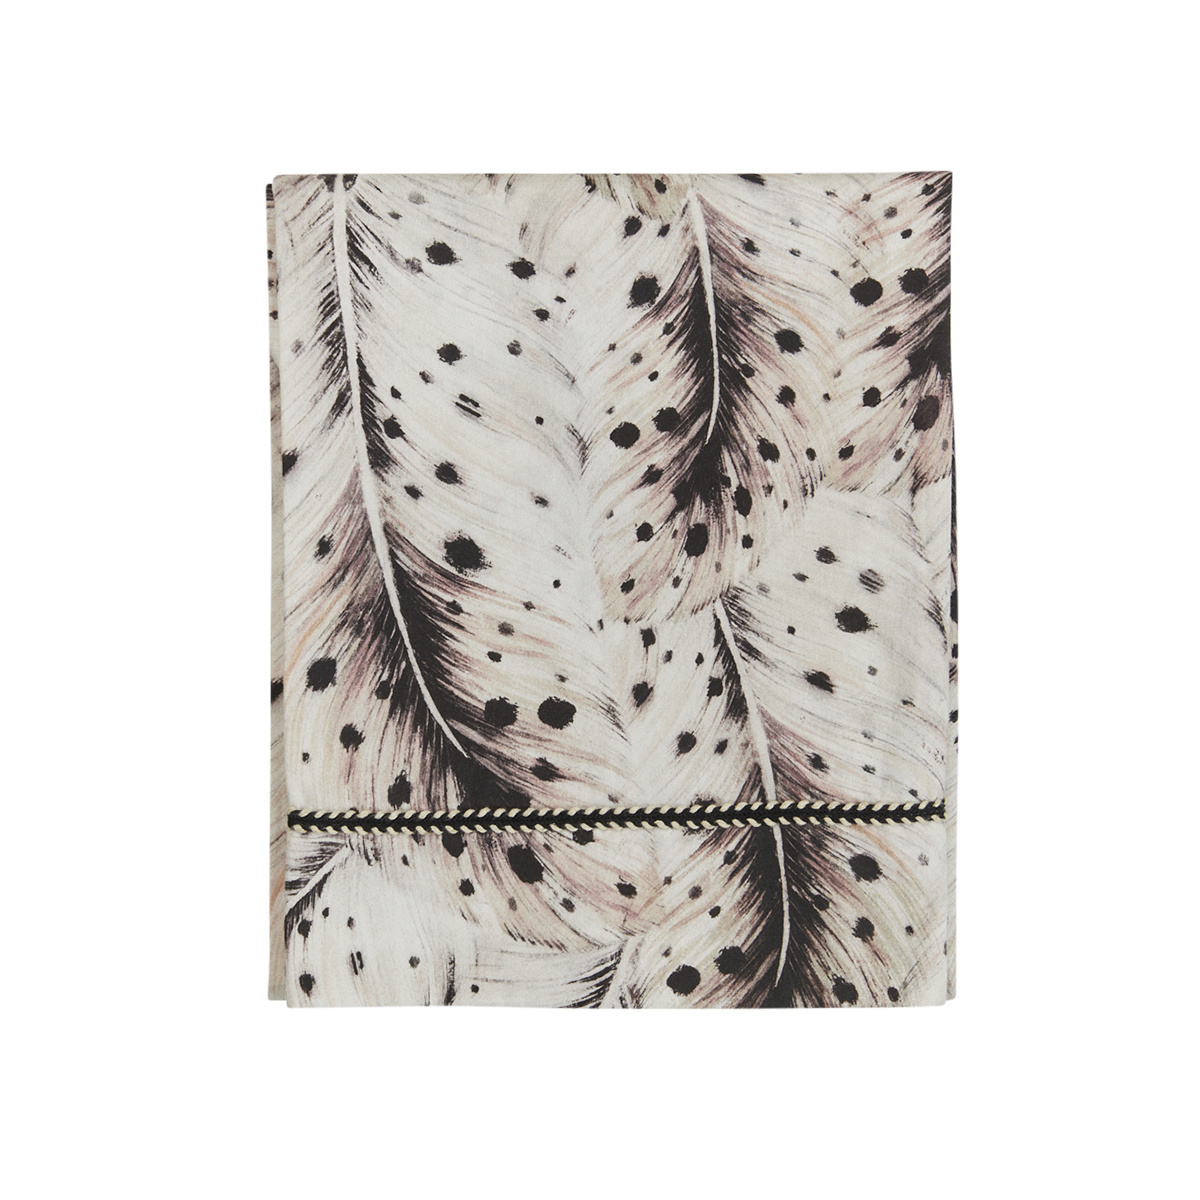 Mies & Co wieg laken feathers-1